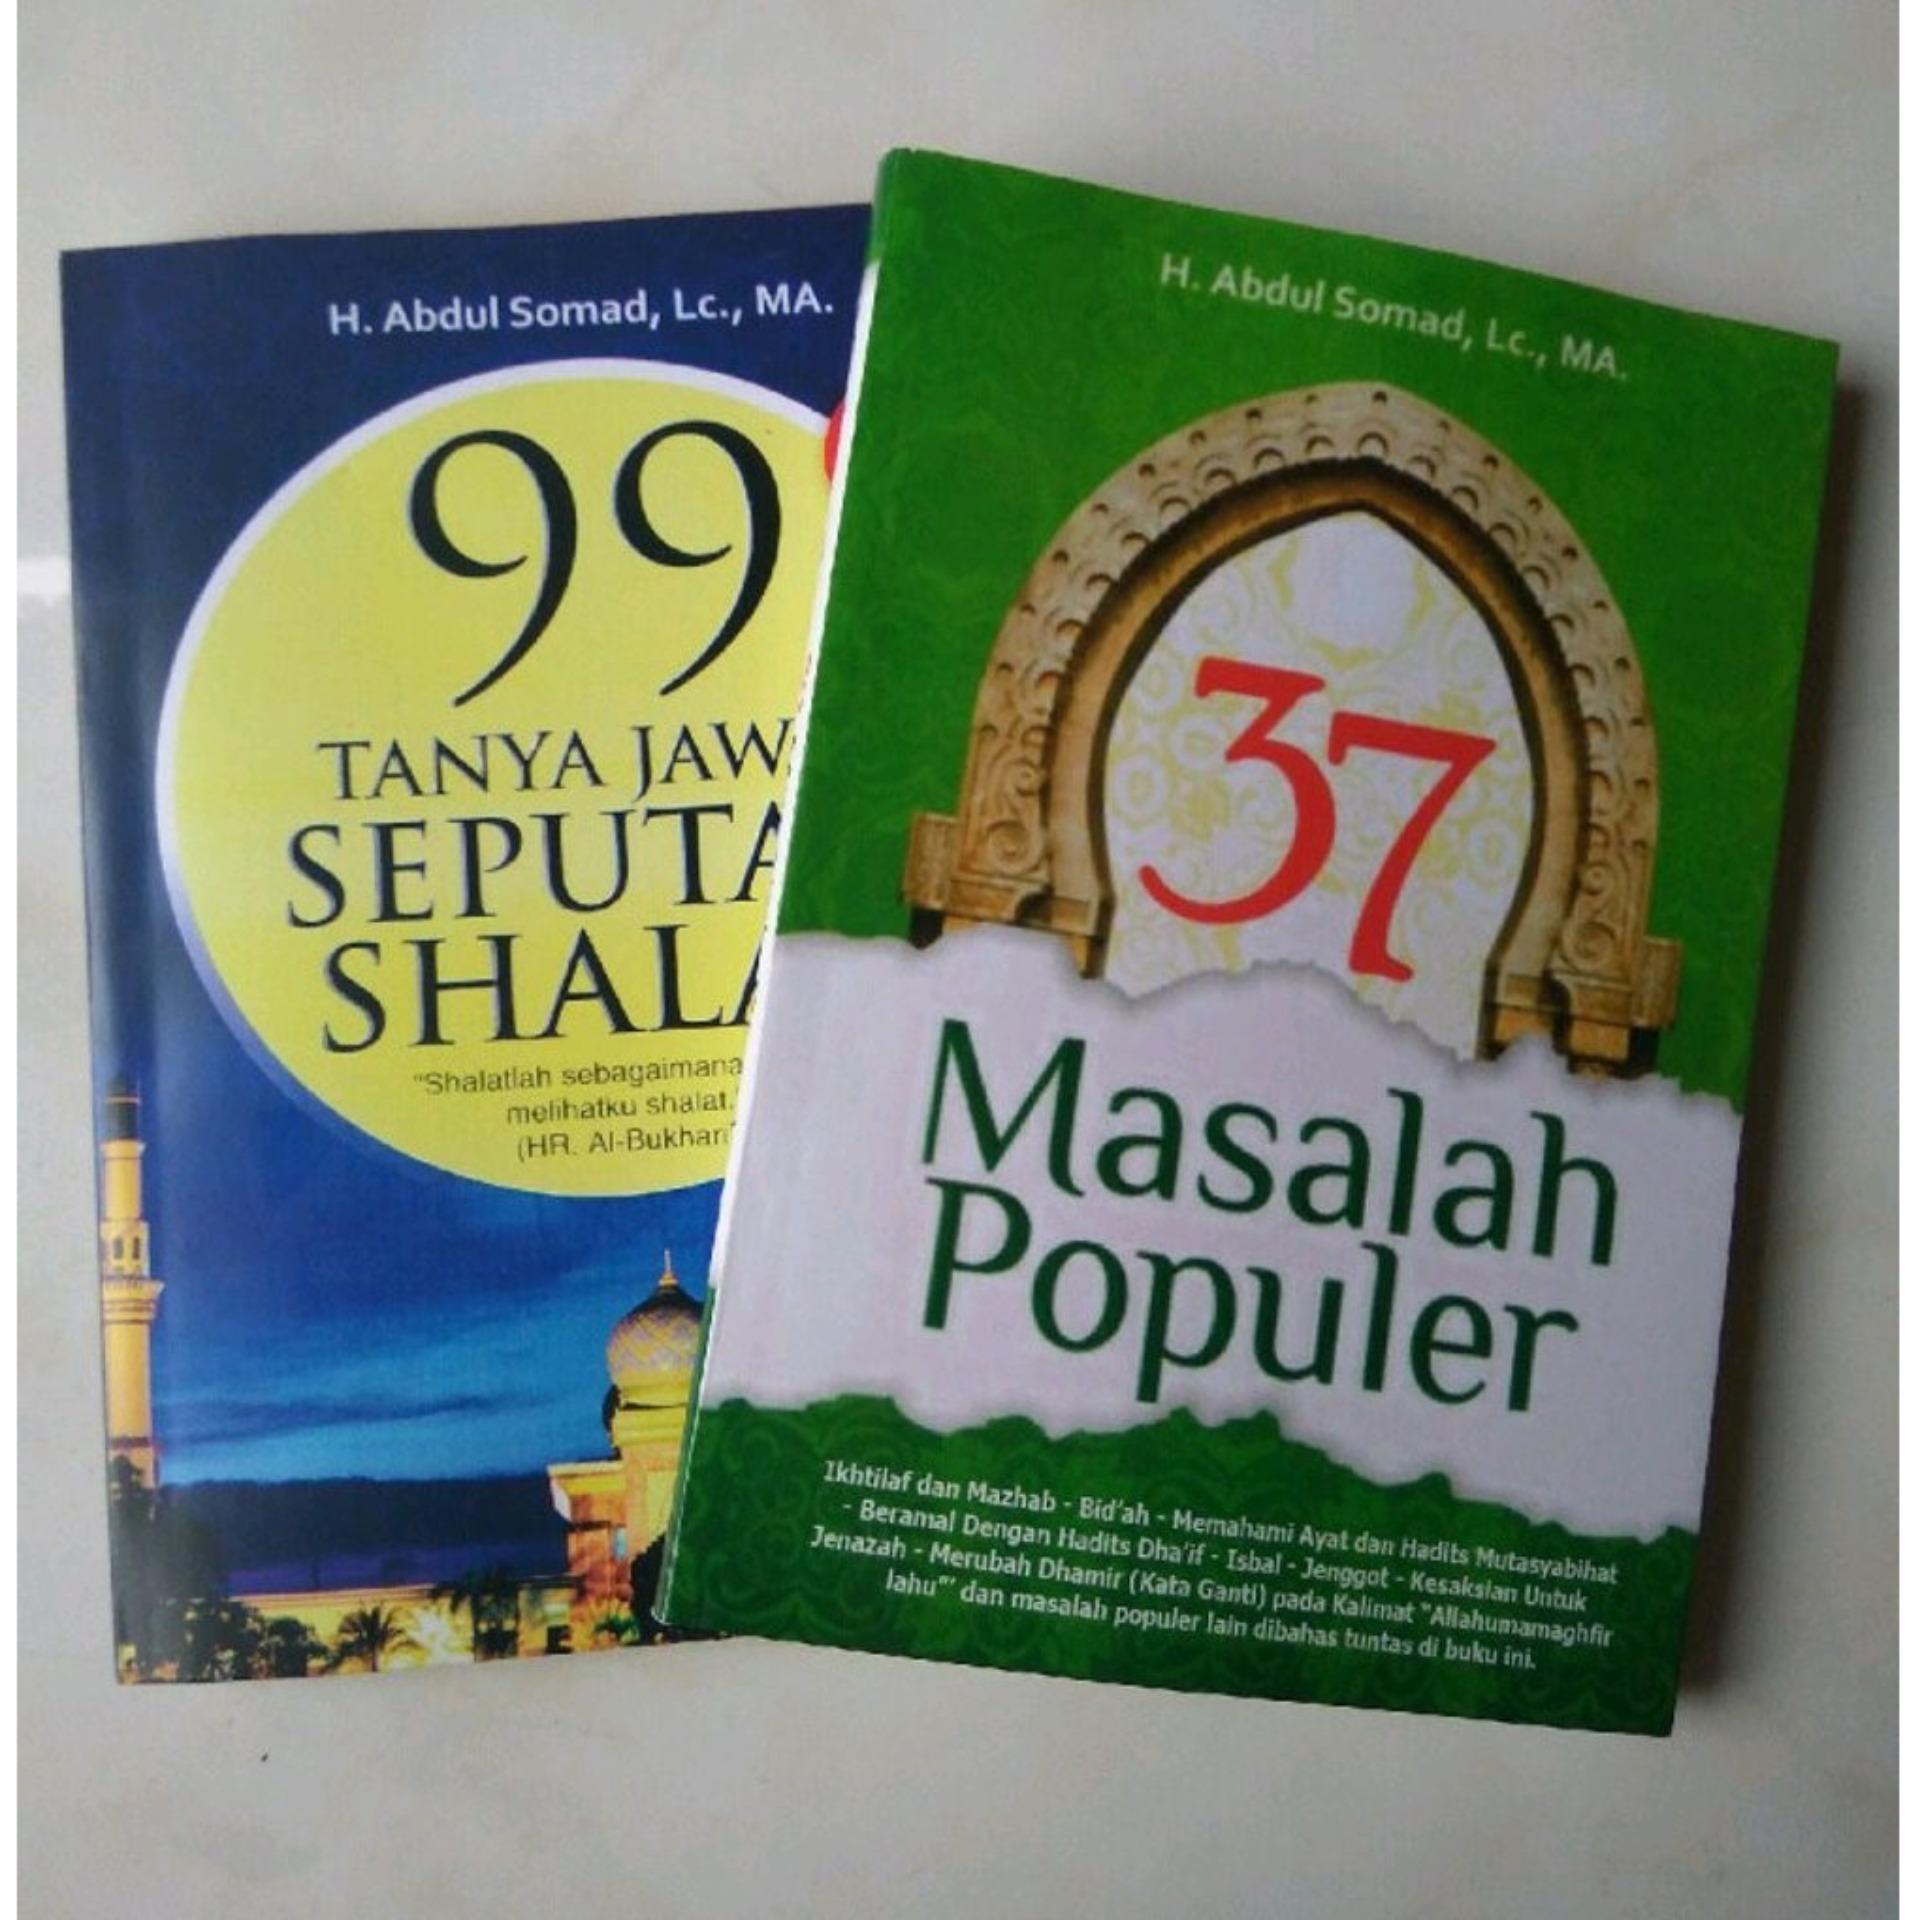 PAKET ORIGINAL 2 BUKU USTADZ ABDUL SOMAD (37 Masalah Populer + 99 Tanya Jawab Seputar Shalat)